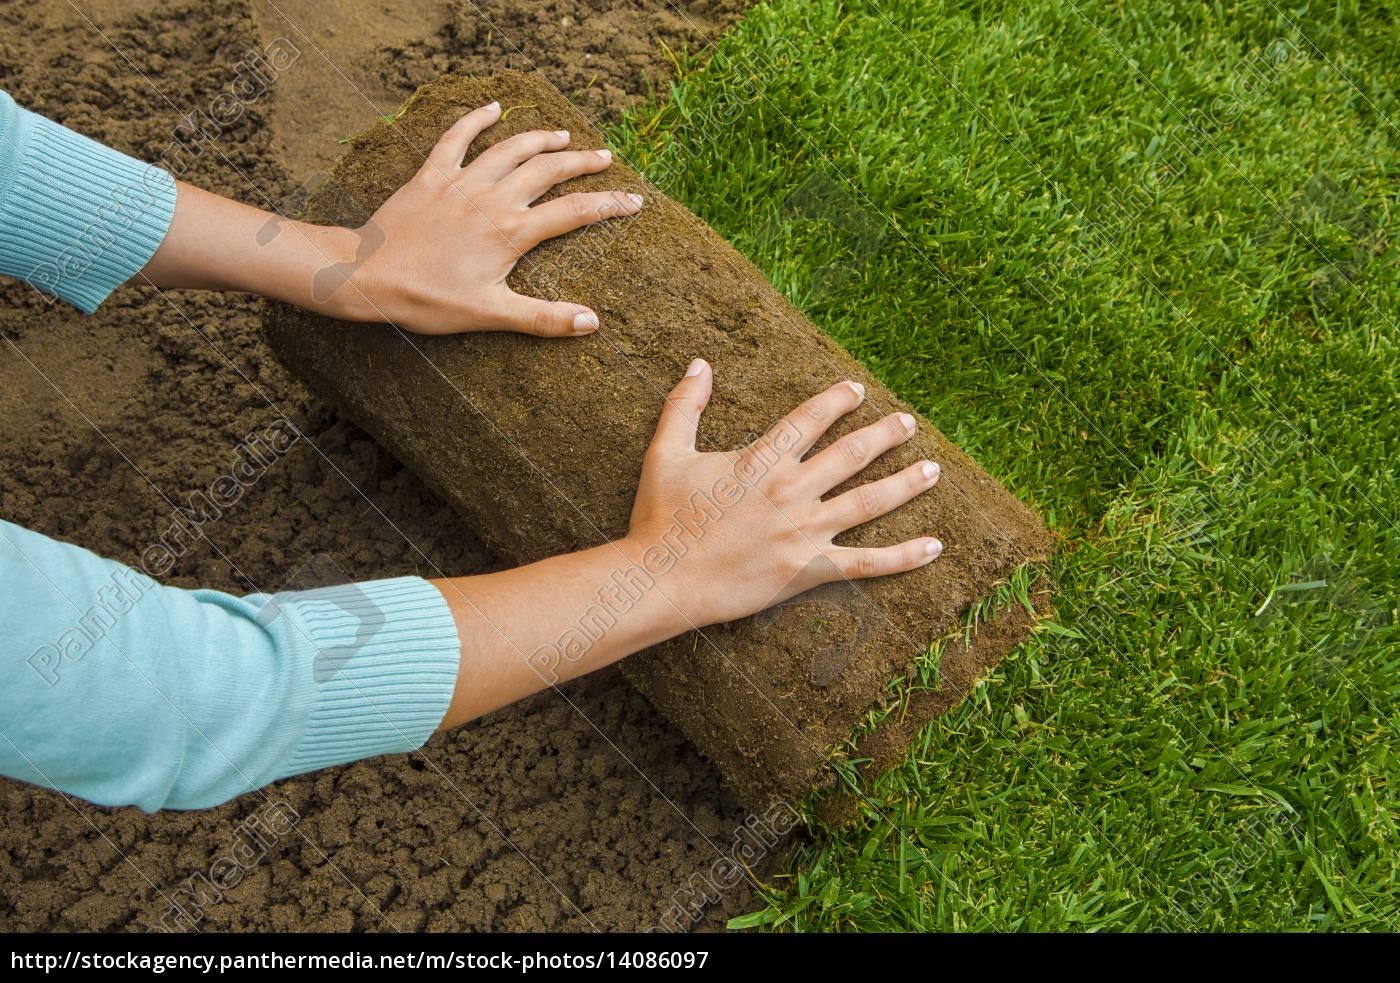 lawned, garden - 14086097